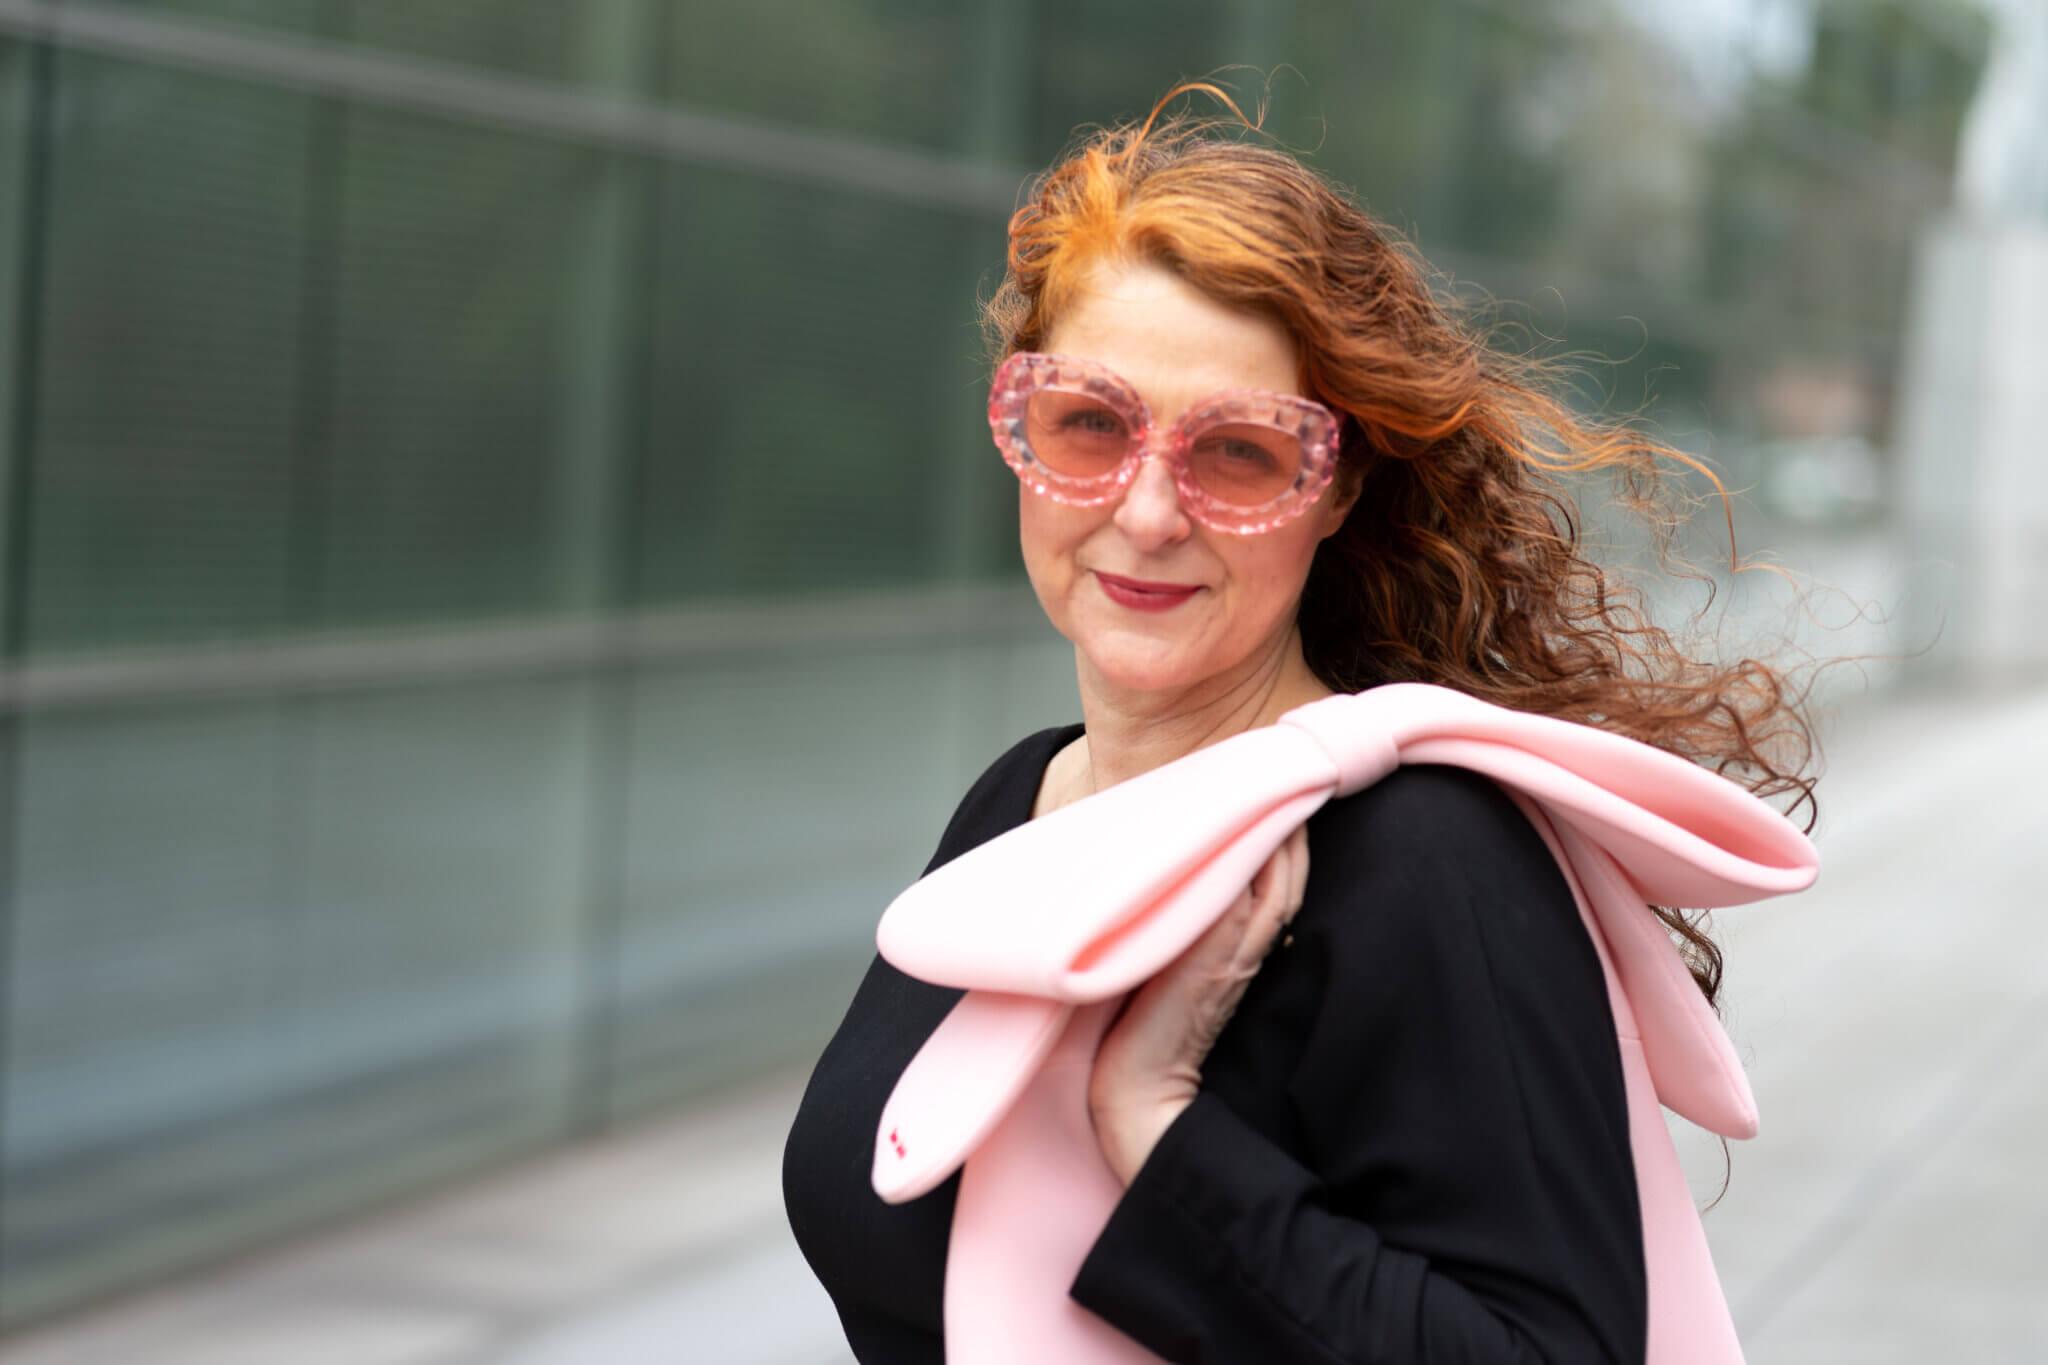 Simone Rocha x hm Sonnenbrille und rosa Shopper